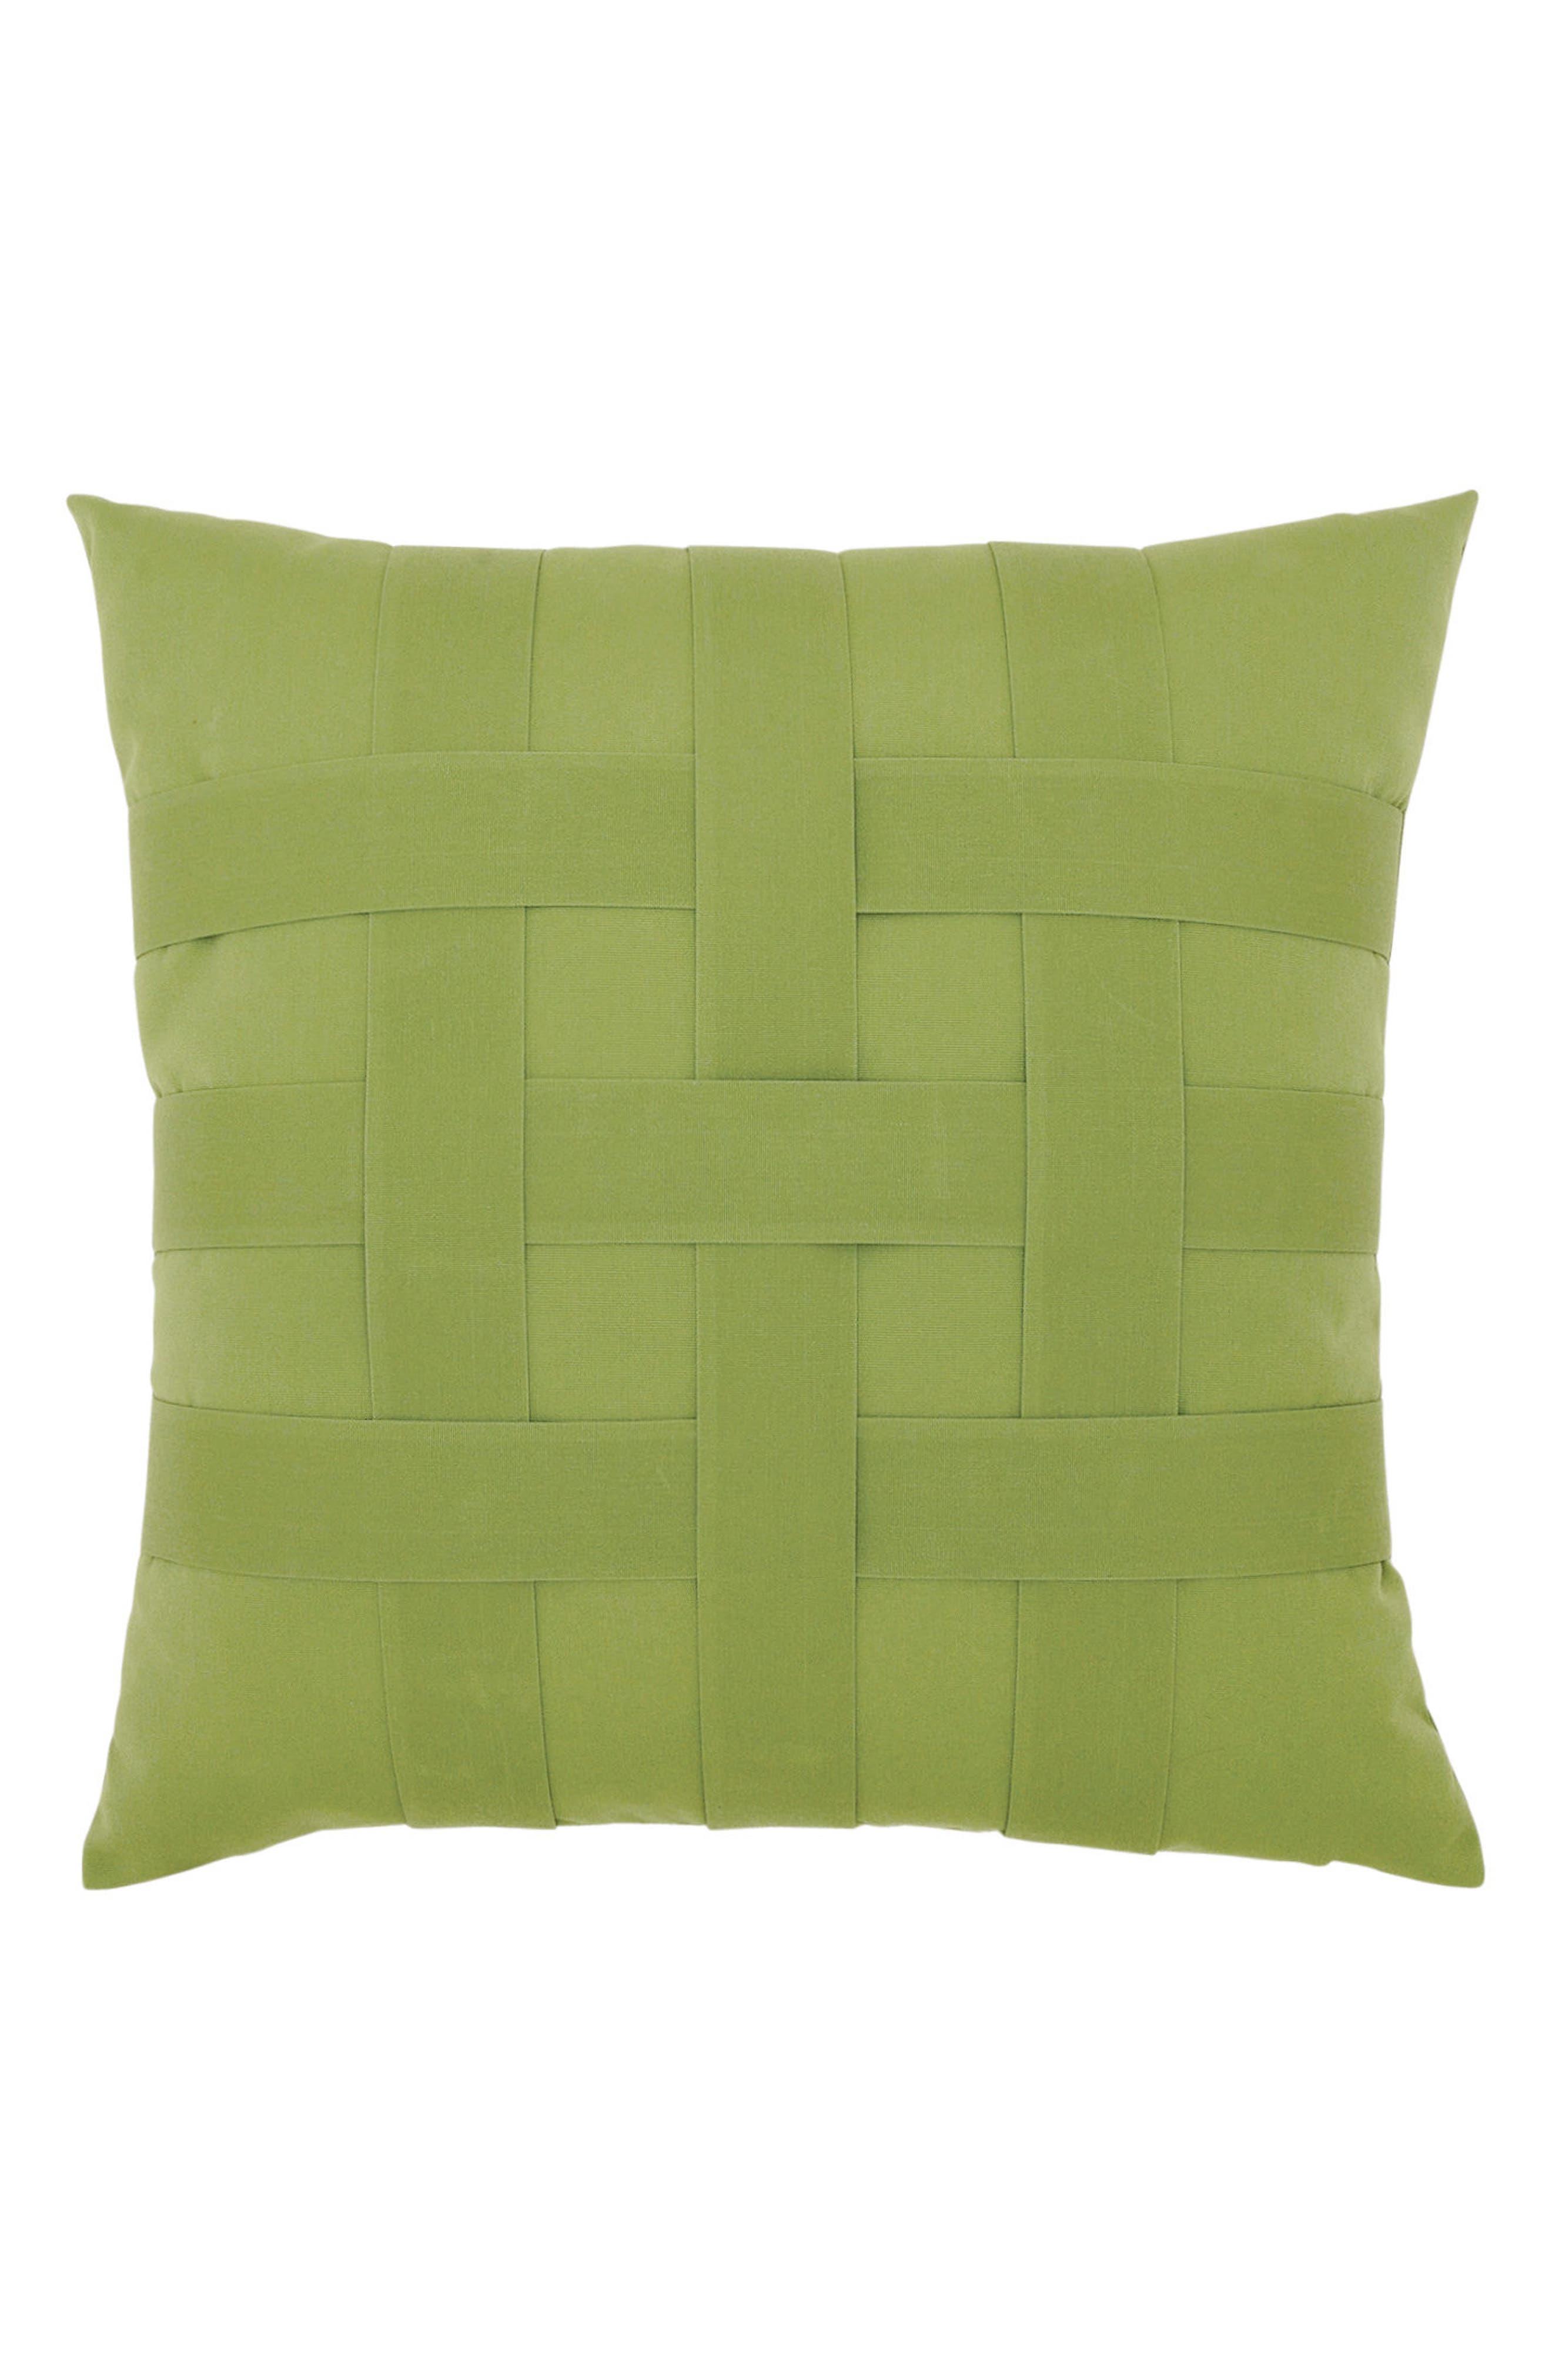 Basket Weave Indoor/Outdoor Accent Pillow,                         Main,                         color, GREEN